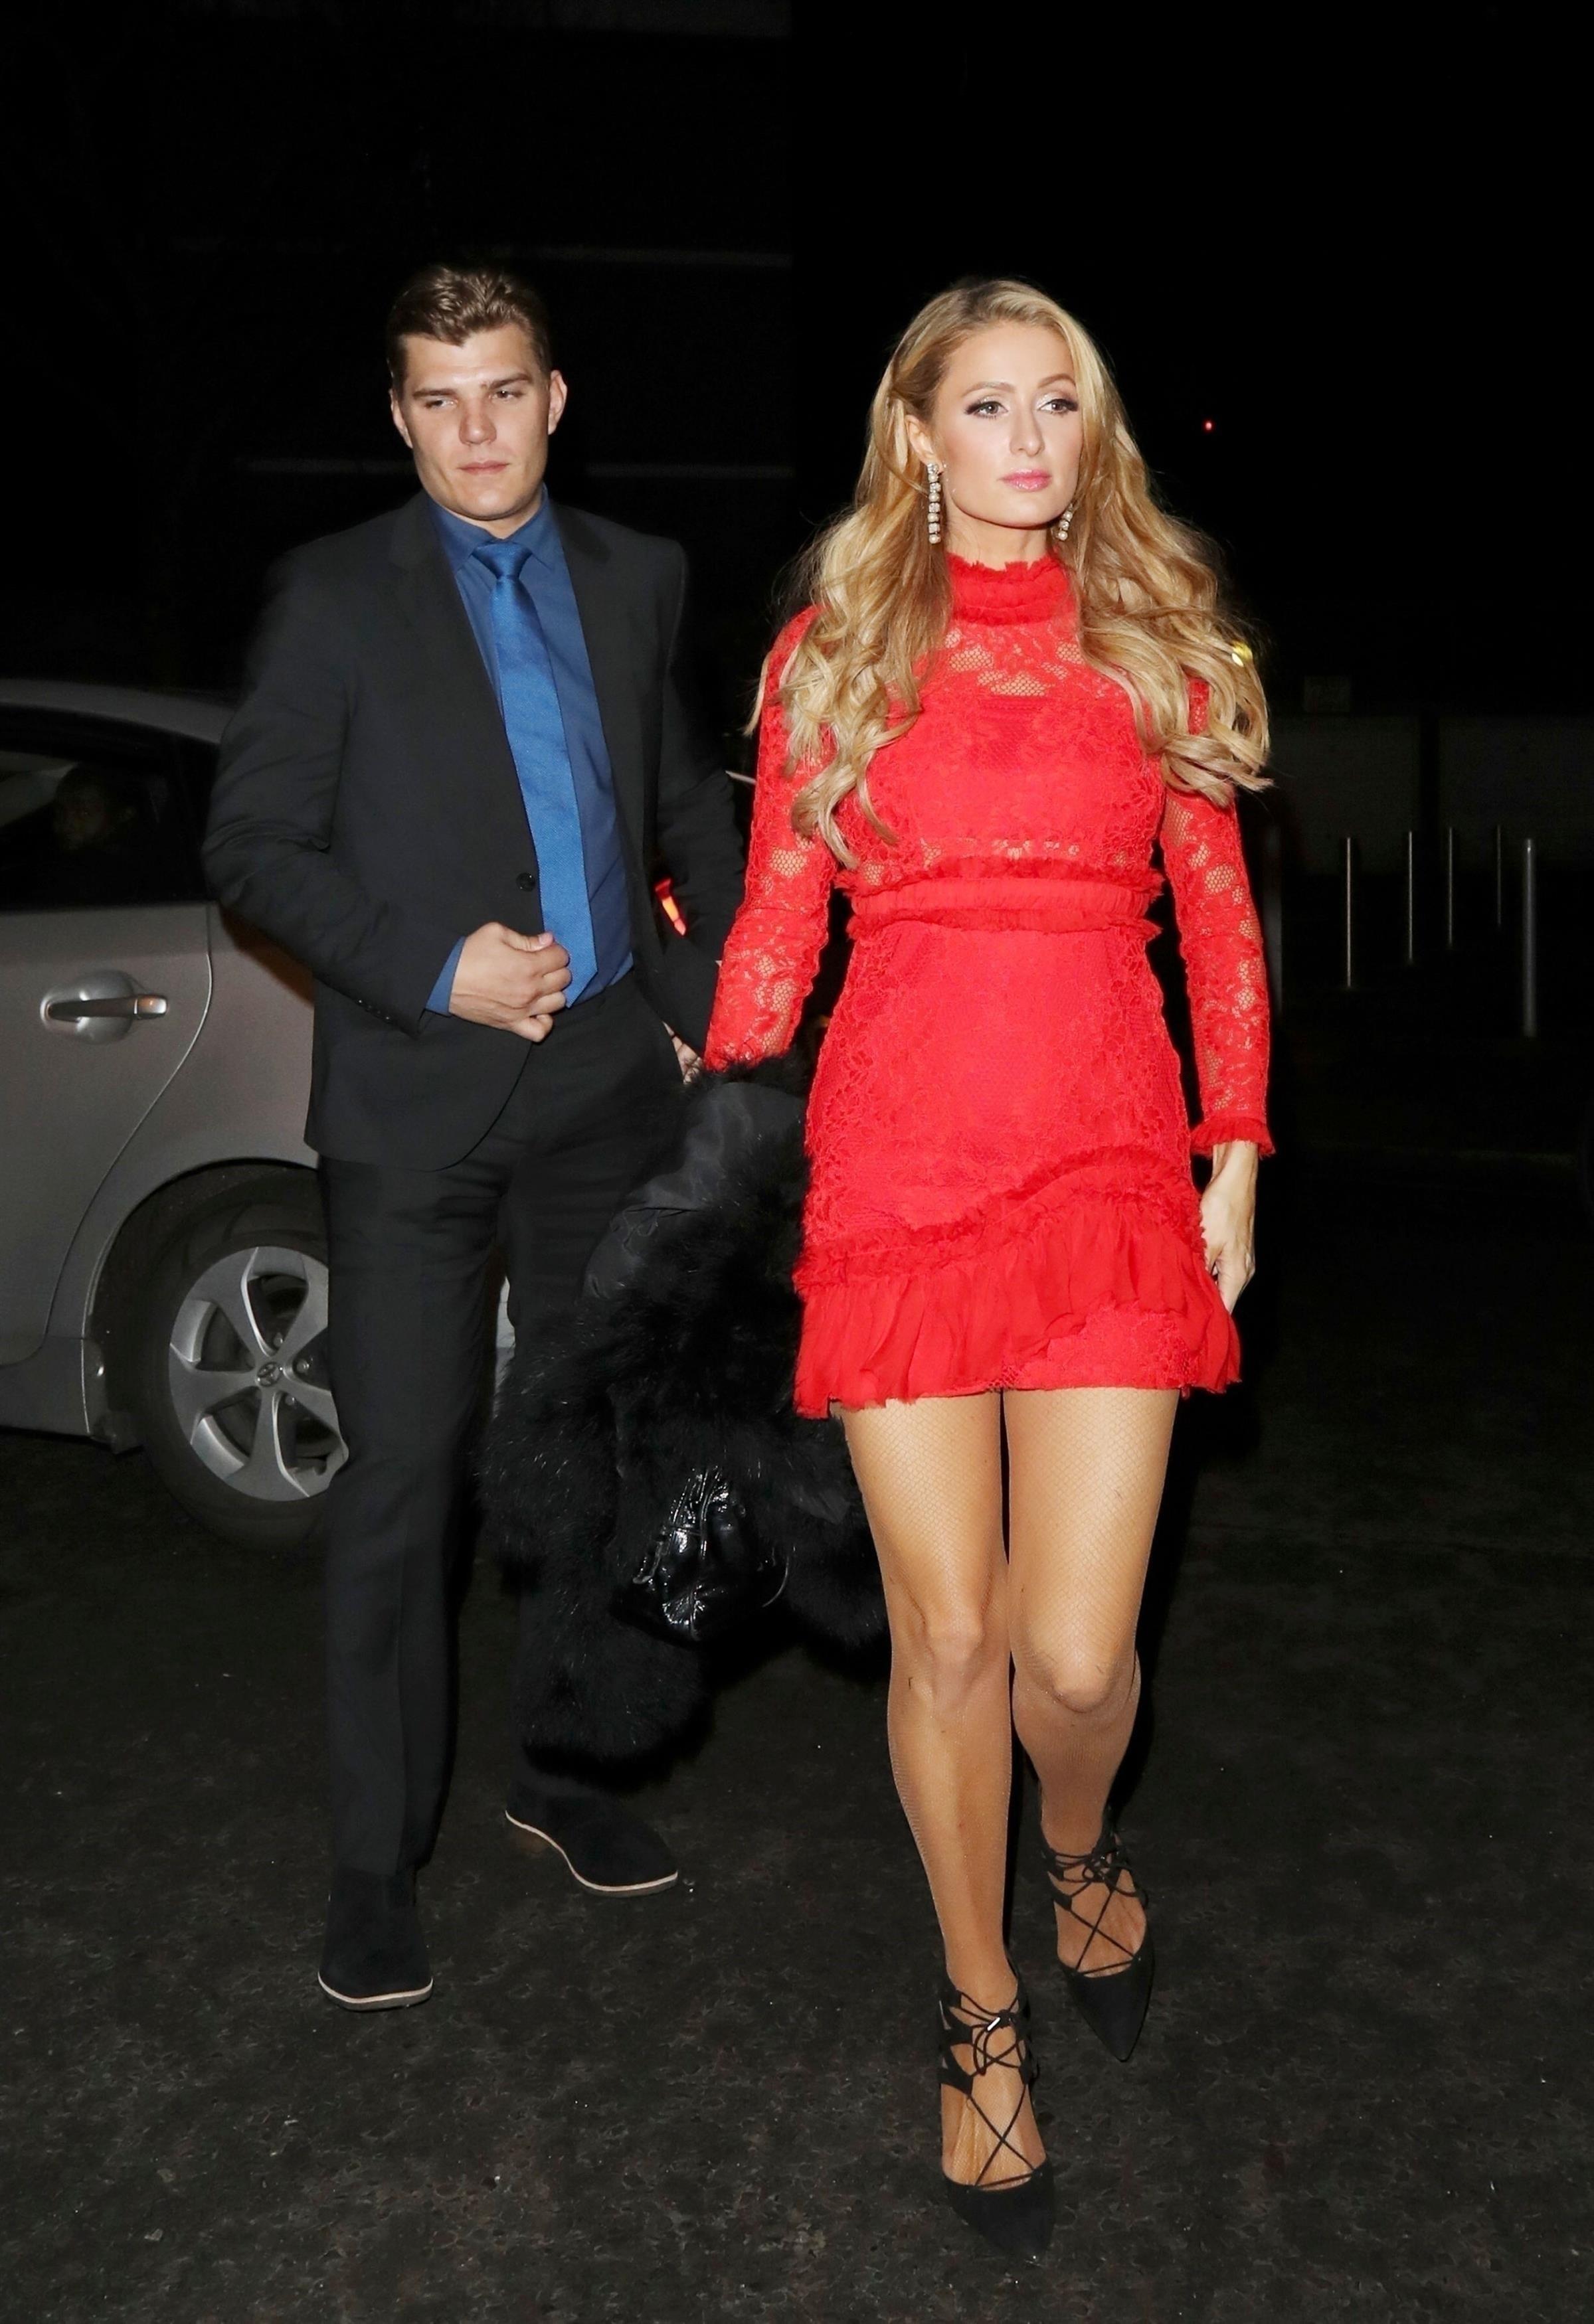 EXCLUSIVE Paris Hilton and Boyfriend Chris Zylka Attend a House Party in West London